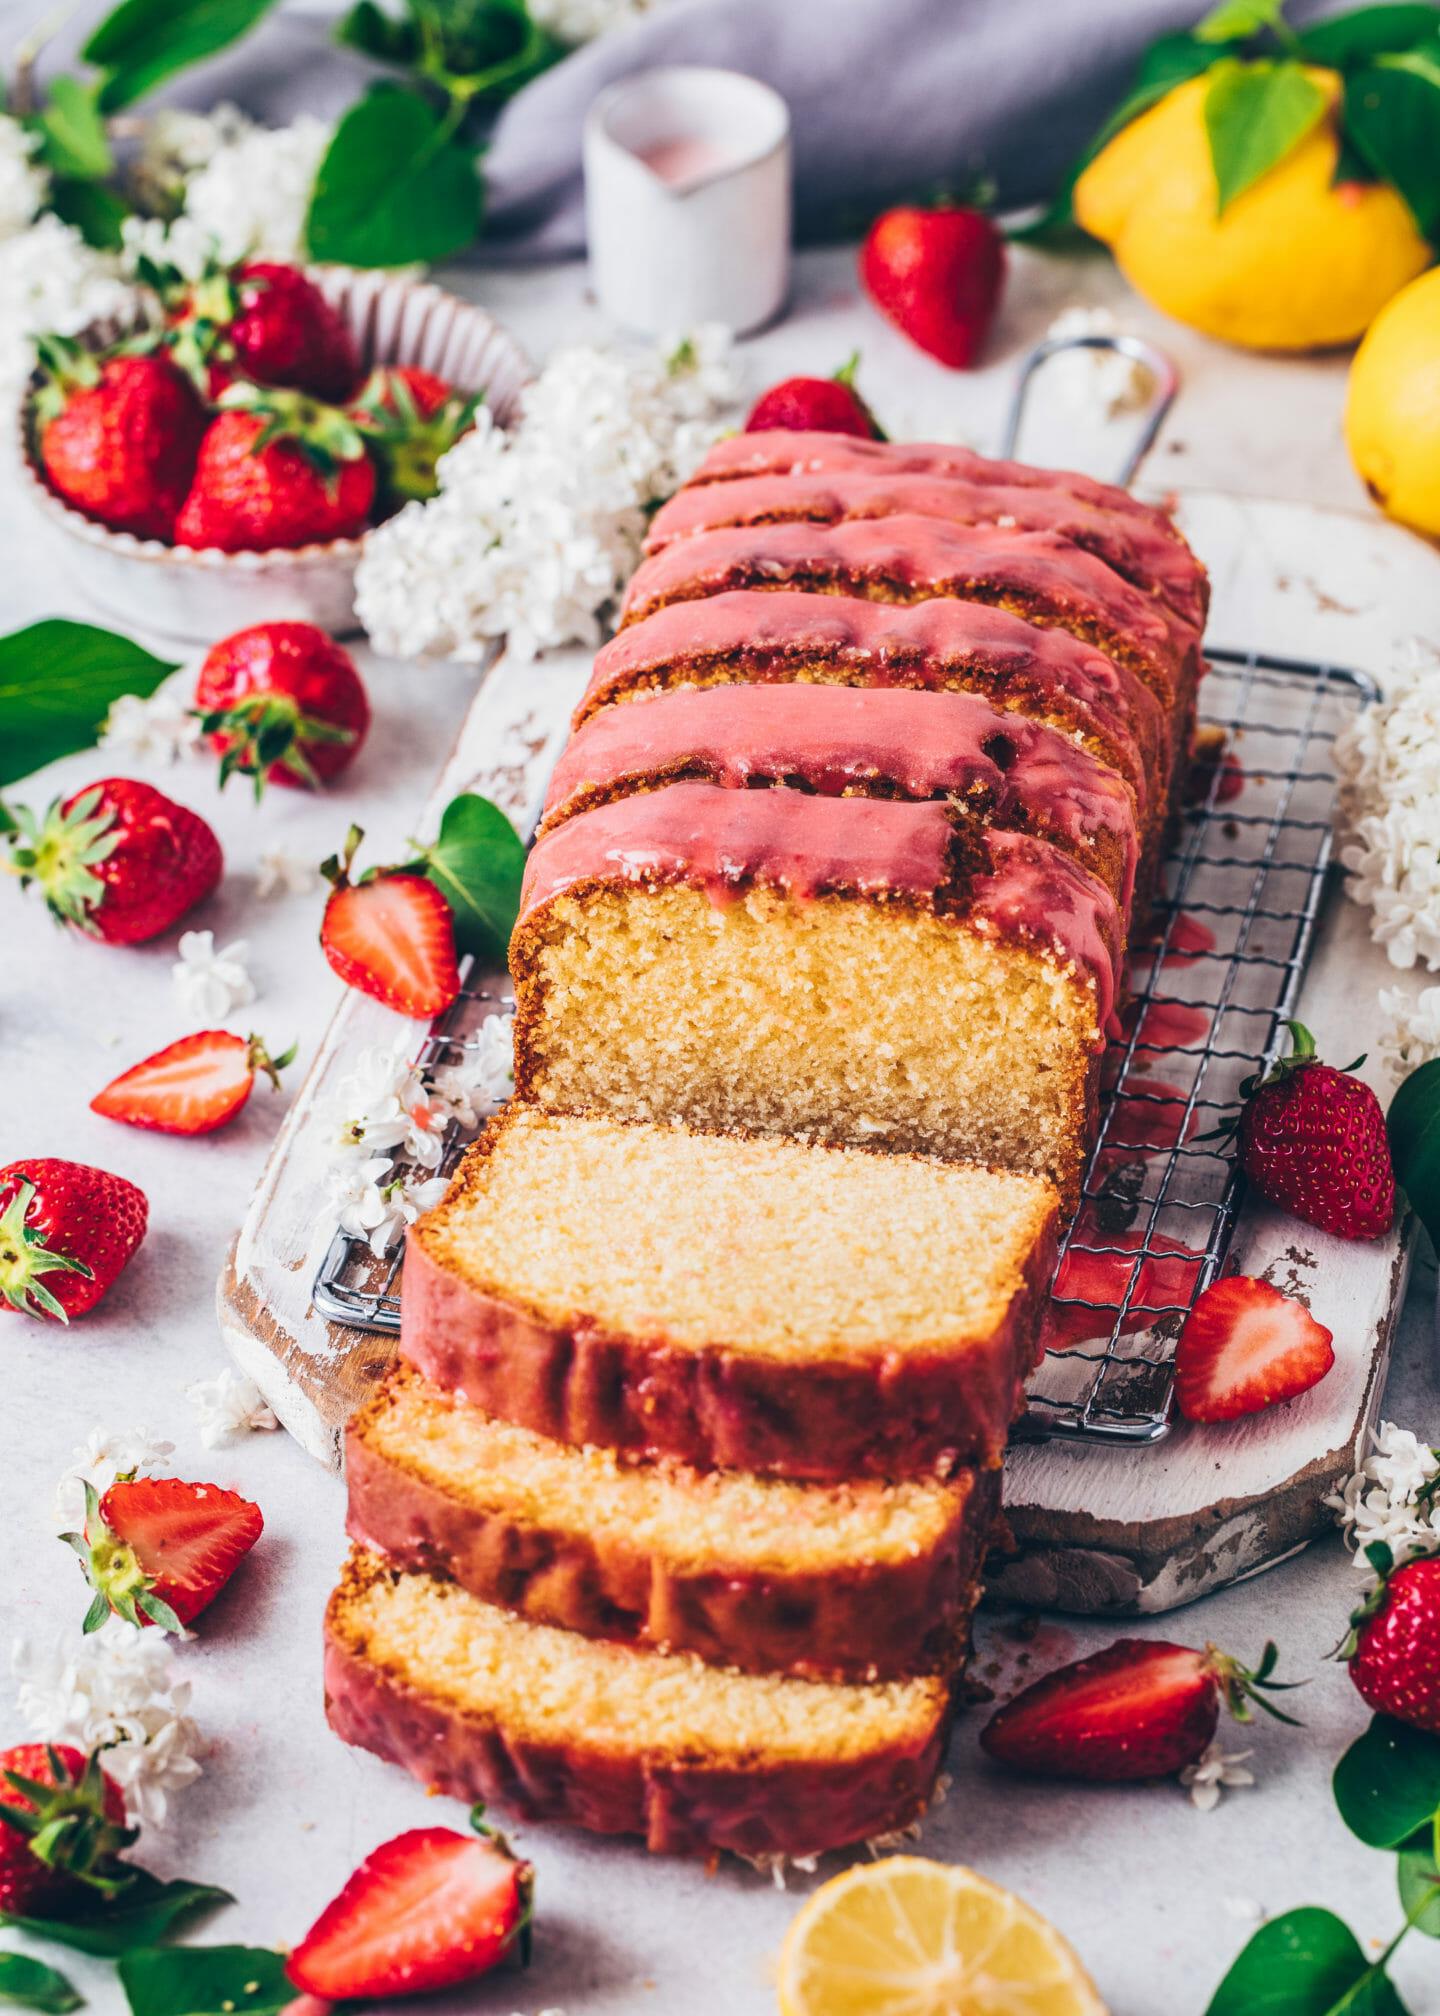 Best Vegan Lemon Cake Loaf with Strawberry Glaze